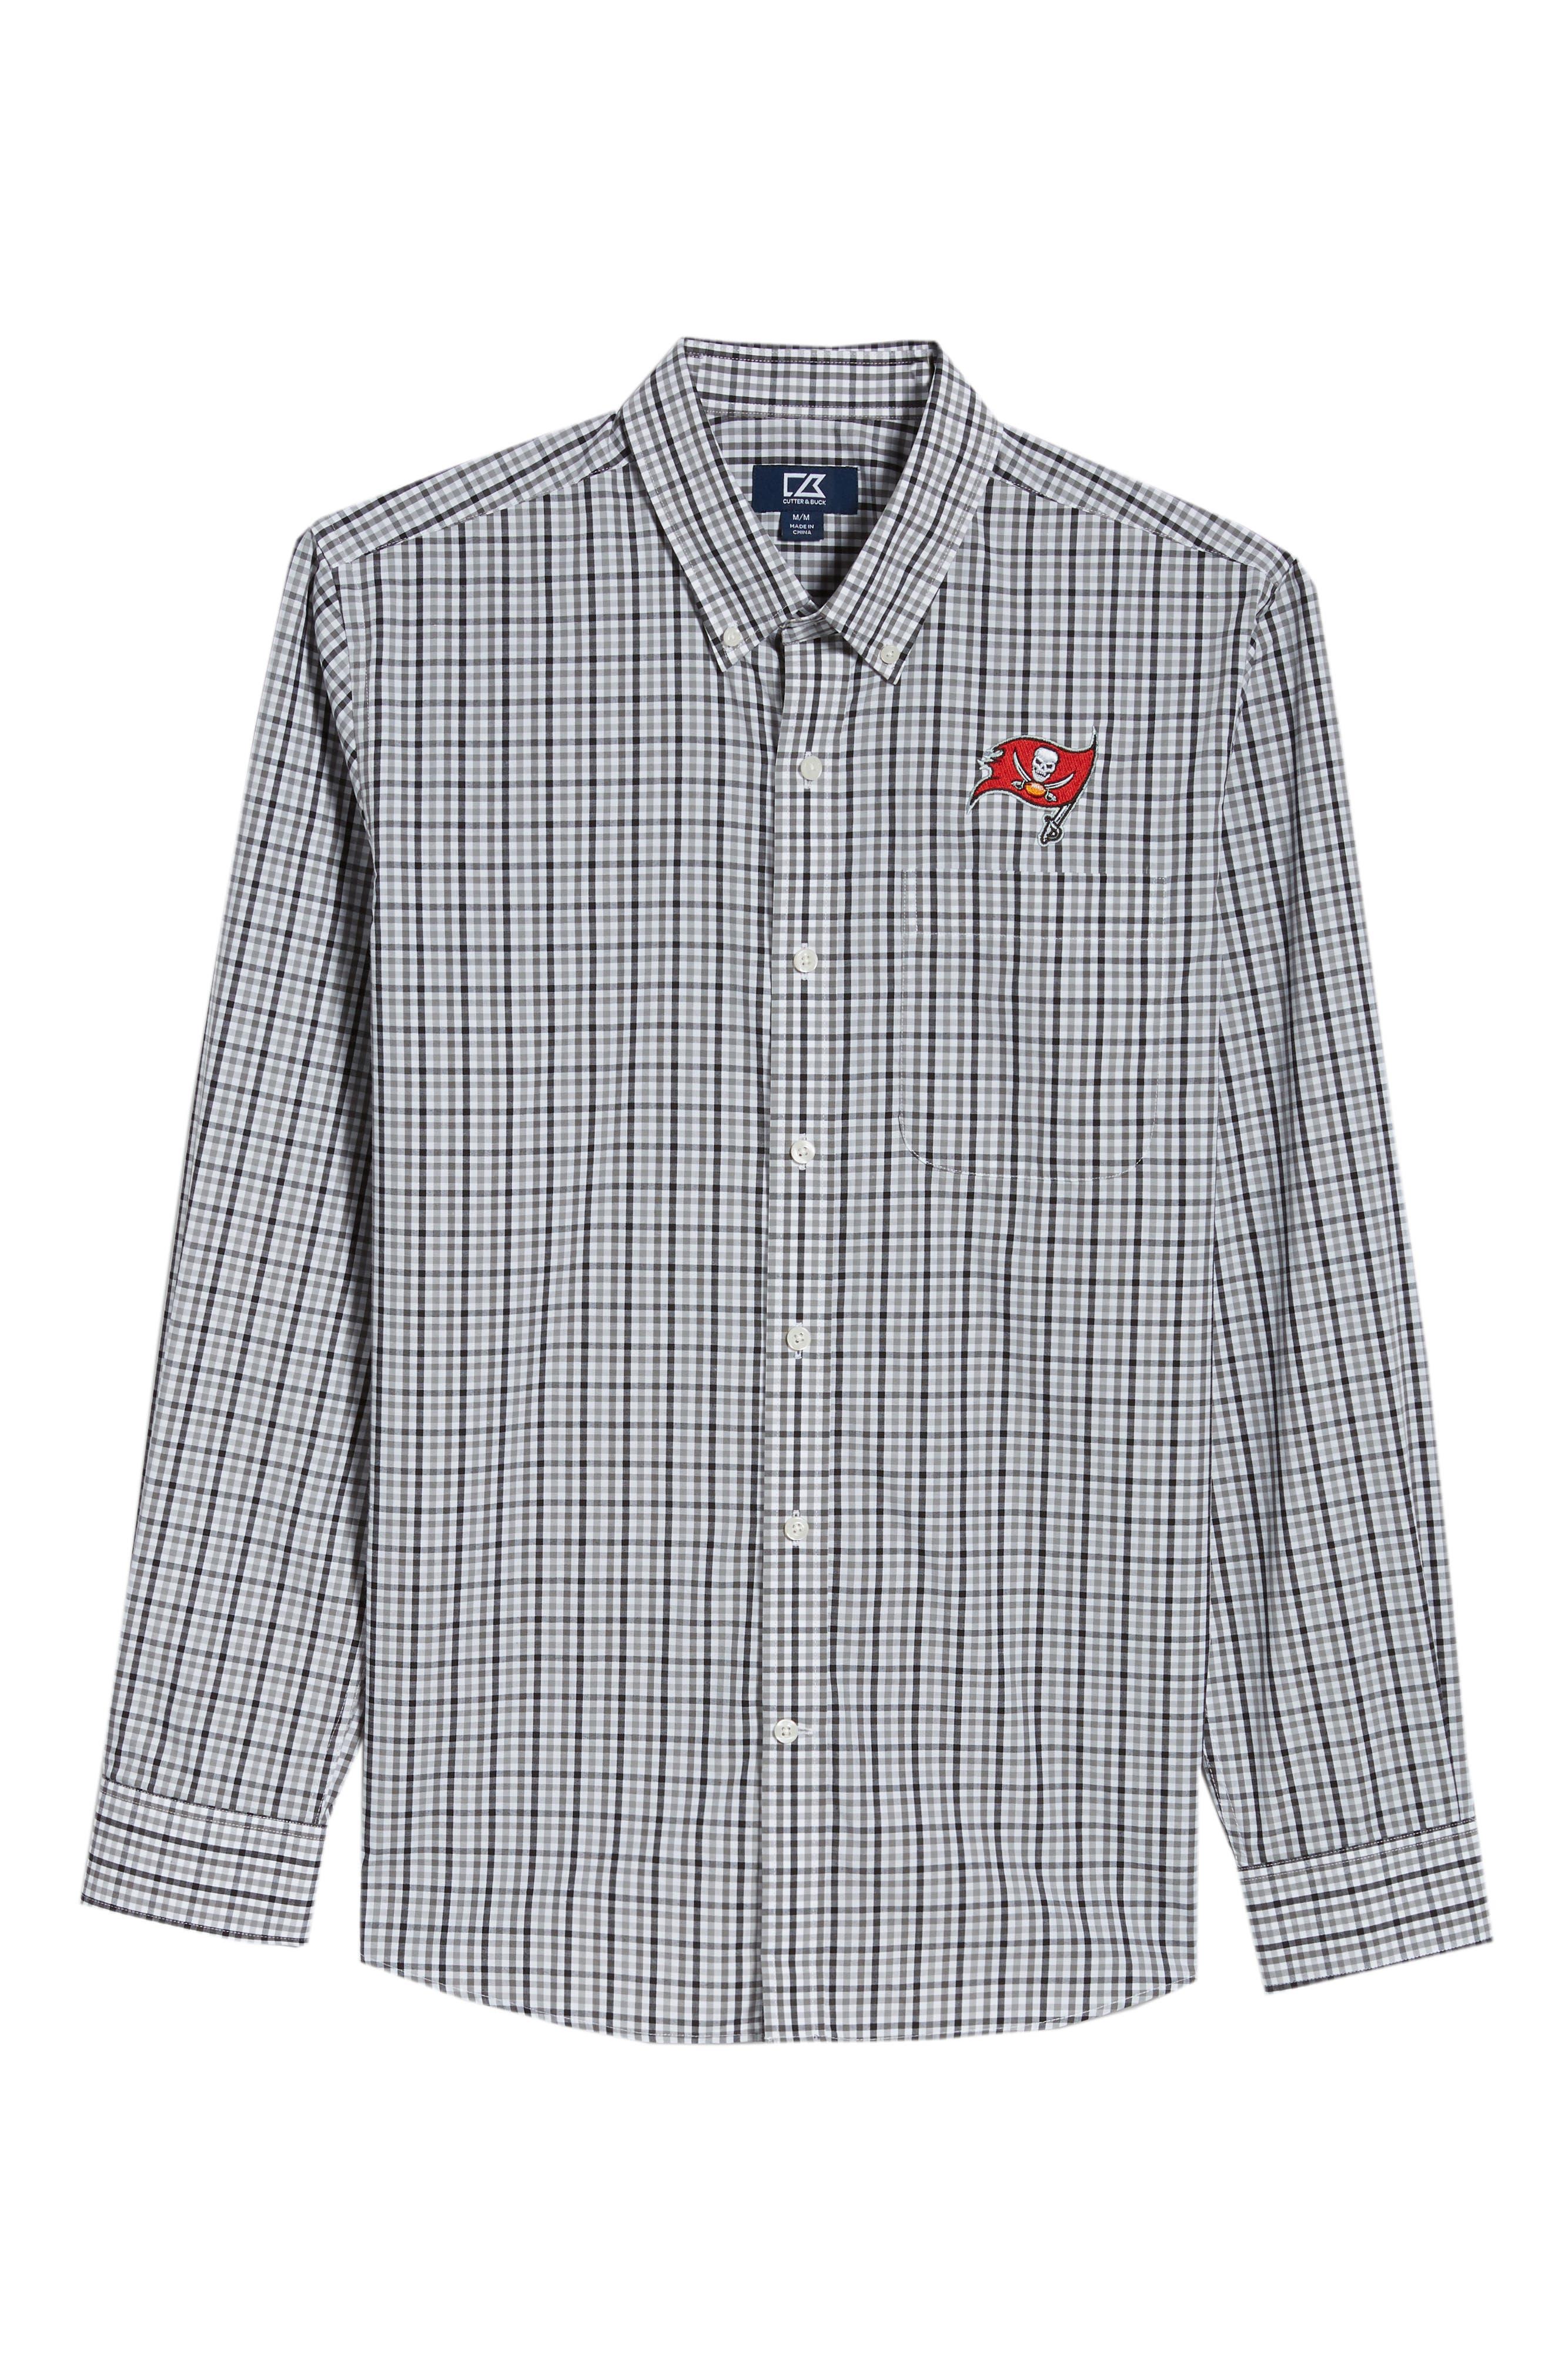 Tampa Bay Buccaneers - Gilman Regular Fit Plaid Sport Shirt,                             Alternate thumbnail 6, color,                             BLACK